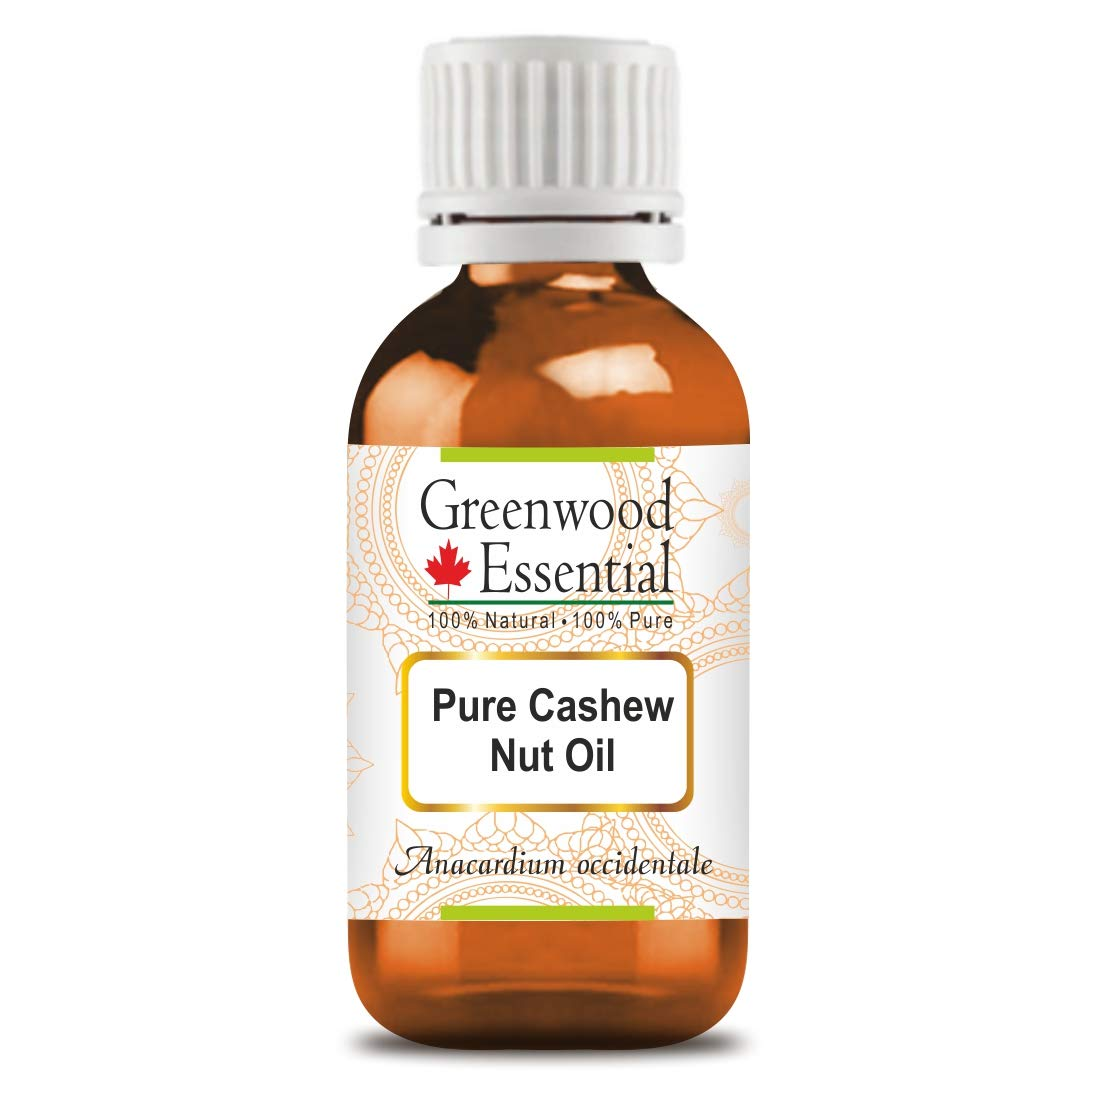 Greenwood Essential Pure Cashew Nut Oil (Anacardium occidentale) Premium Therapeutic Grade for Hair, Skin 30ml (1.01 oz)